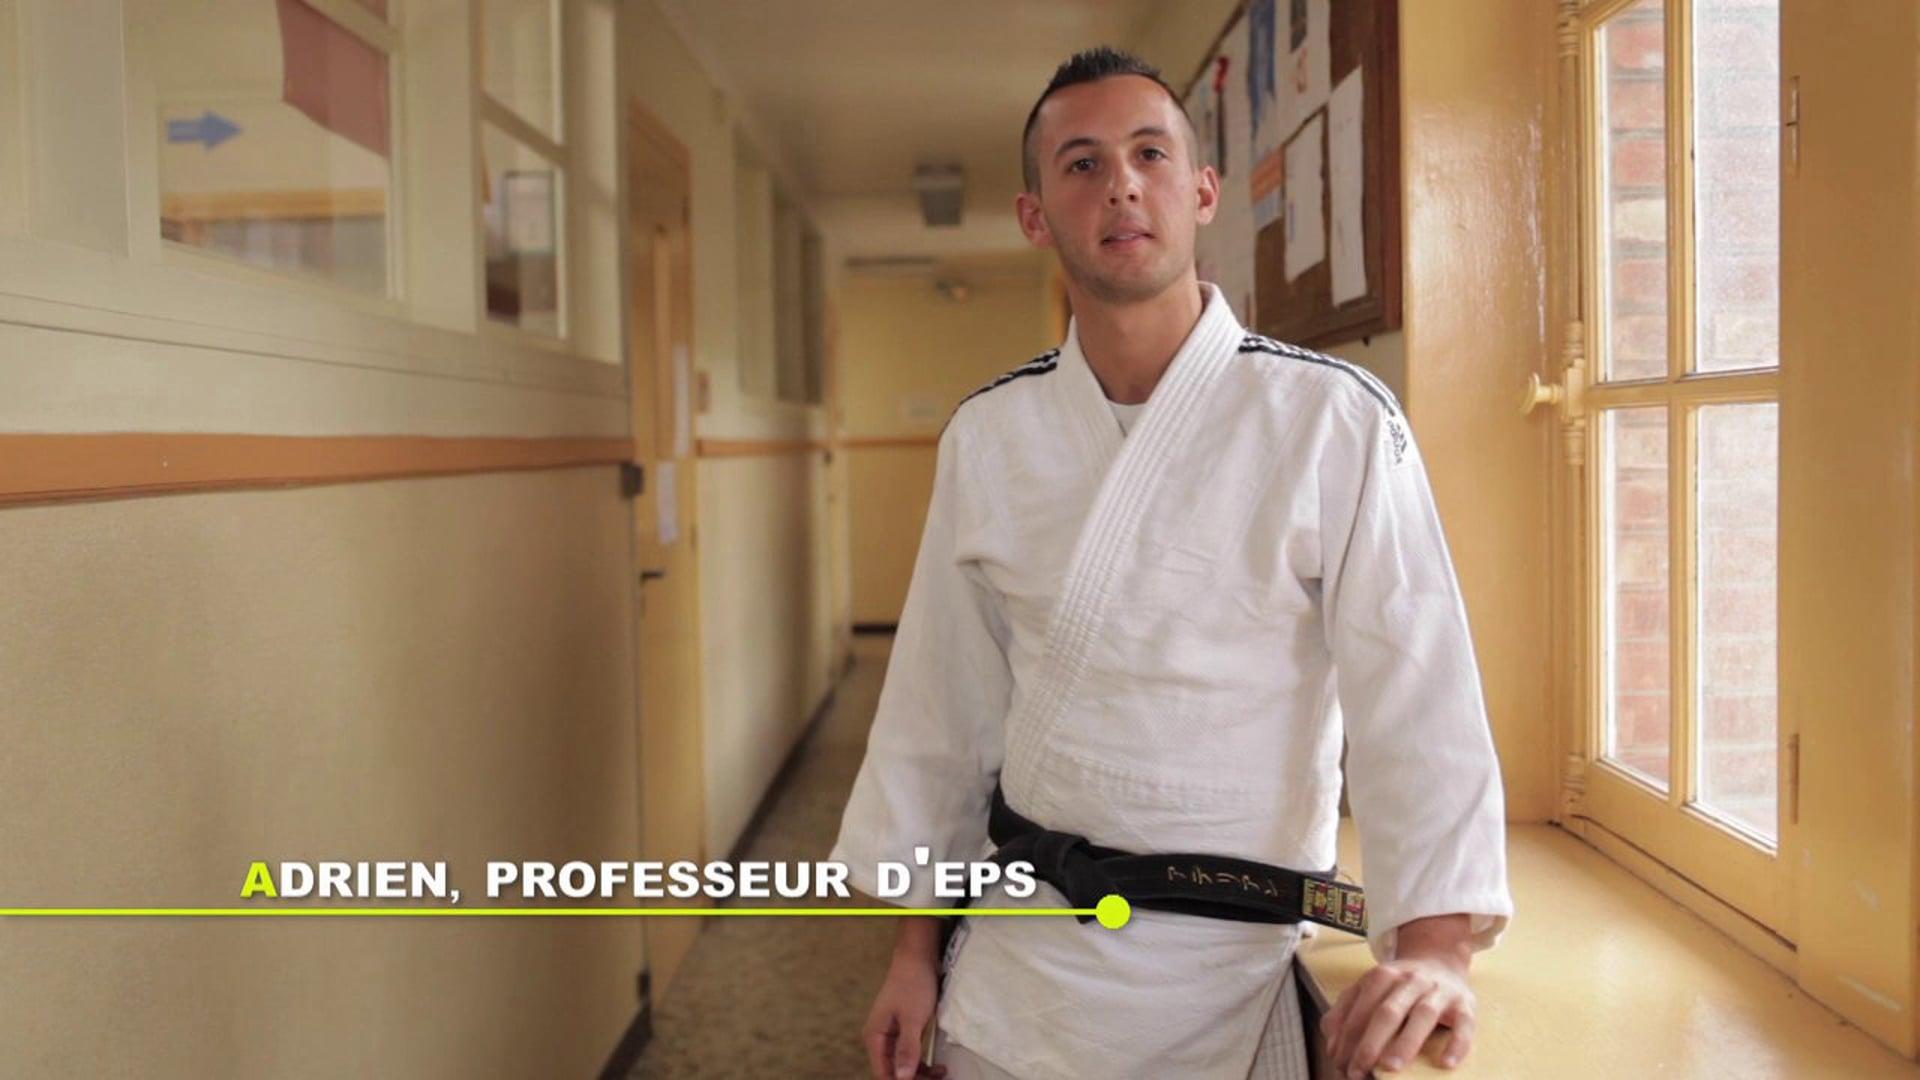 Devenir Enseignant - Adrien